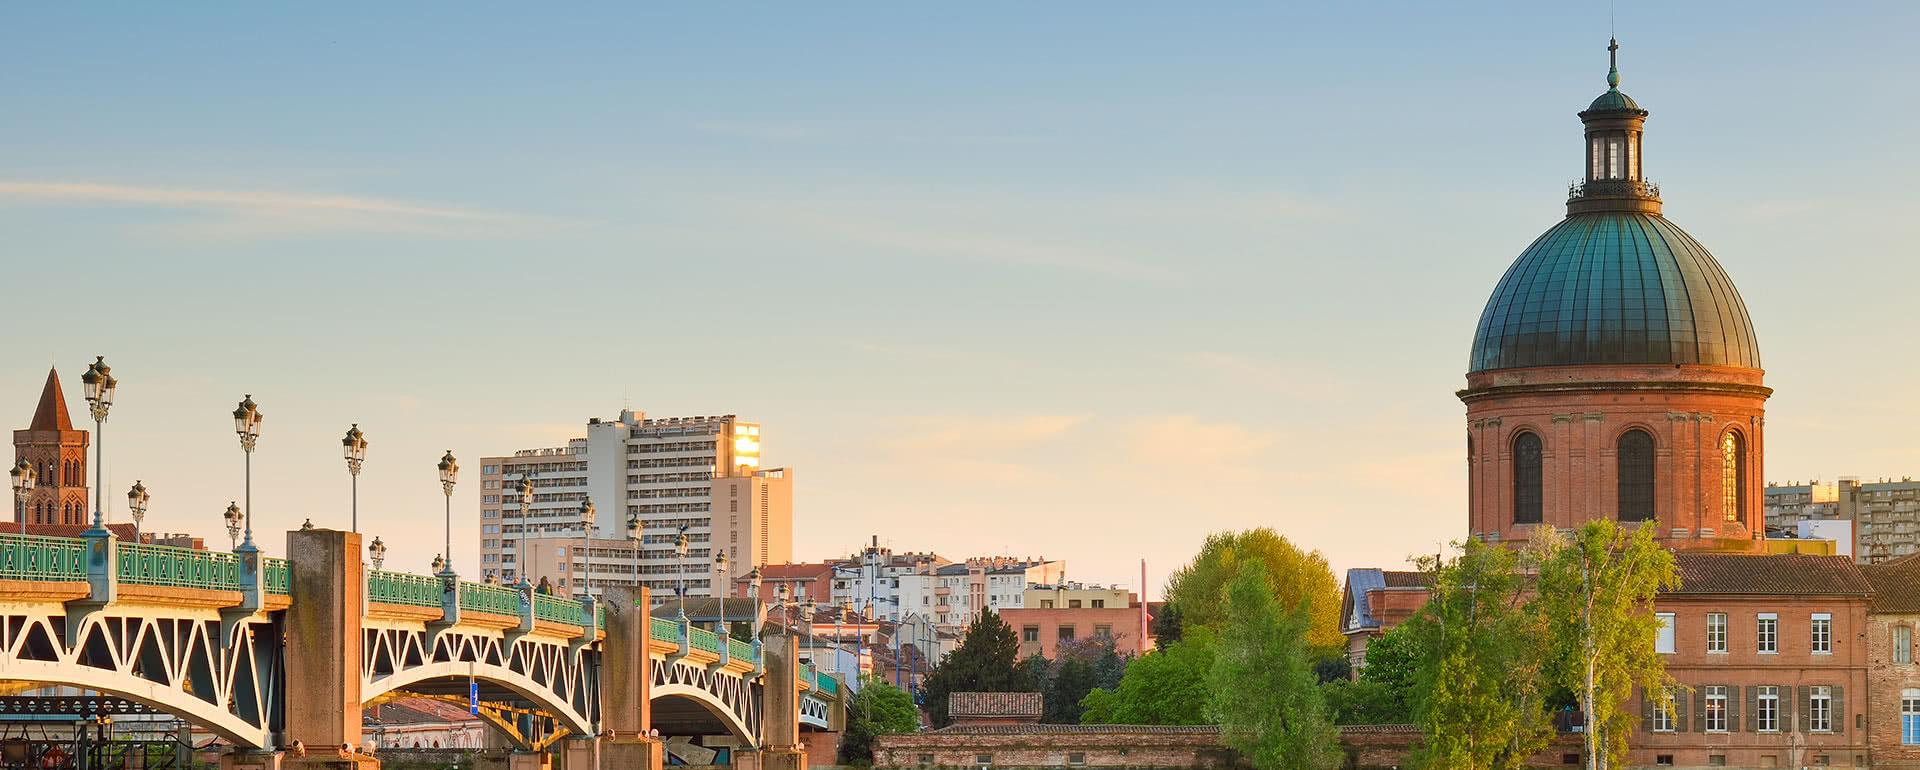 Titelbild von Toulouse